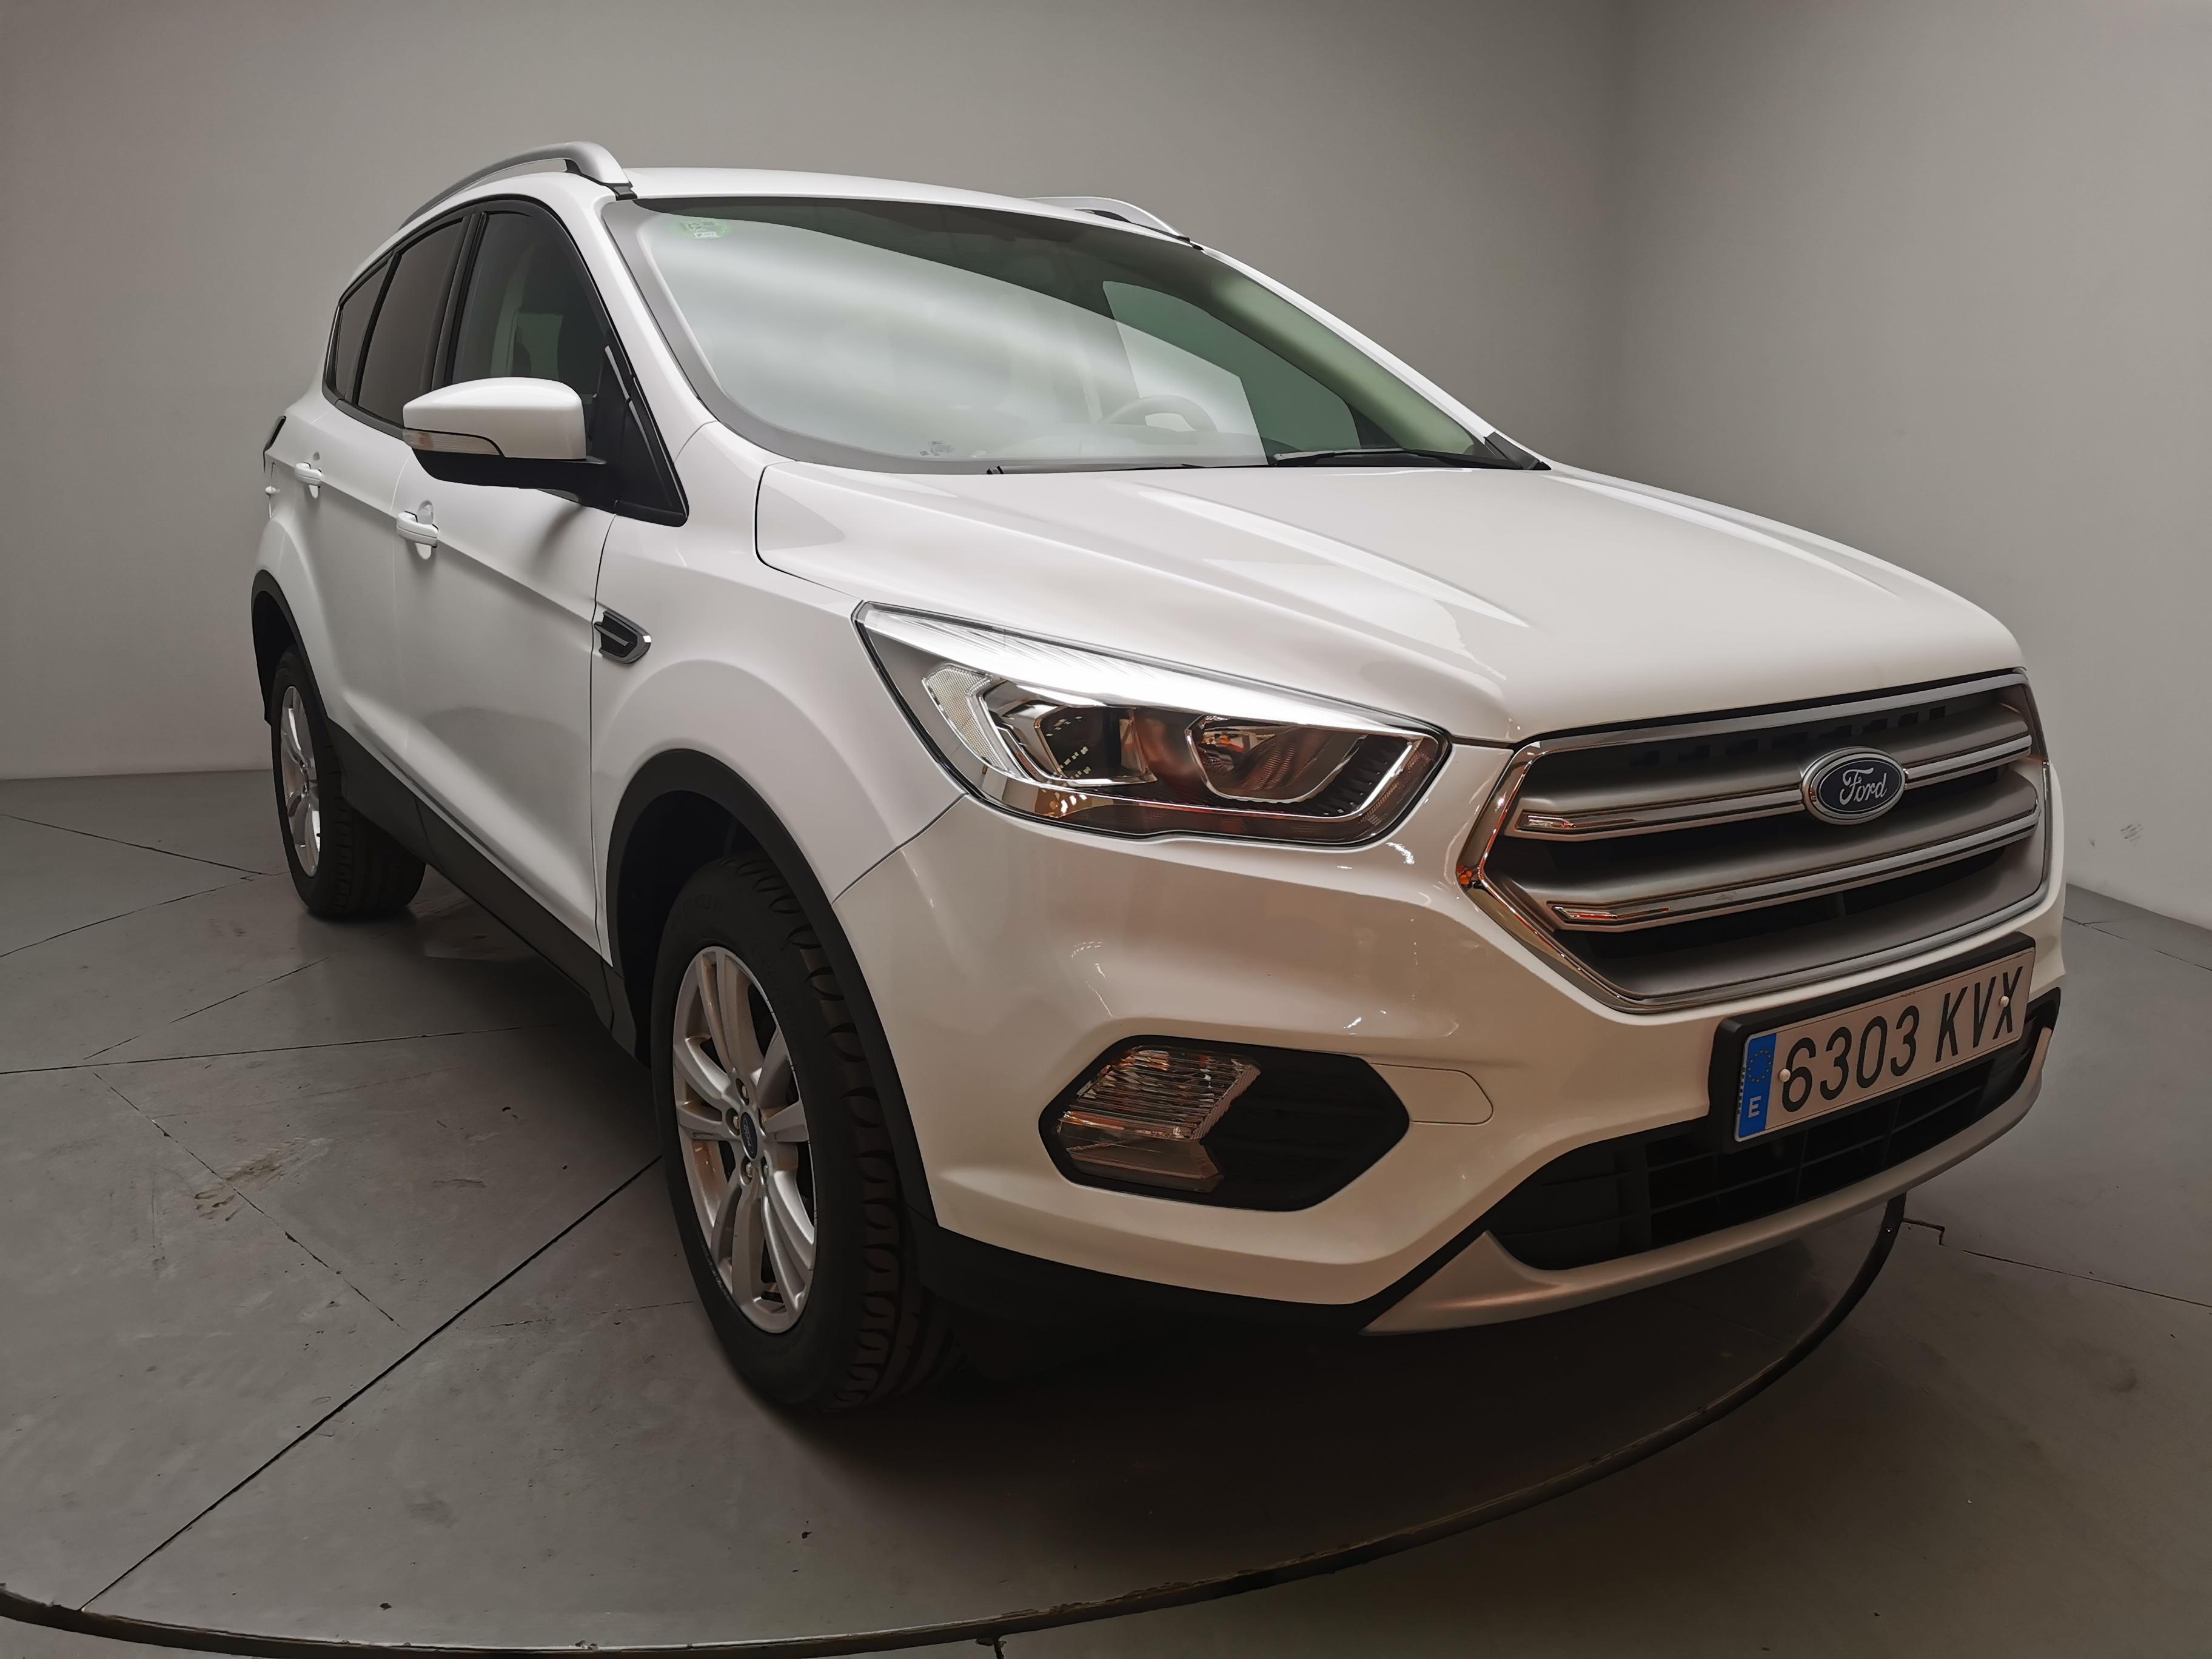 Ford Kuga ocasión segunda mano 2019 Gasolina por 17.900€ en Málaga